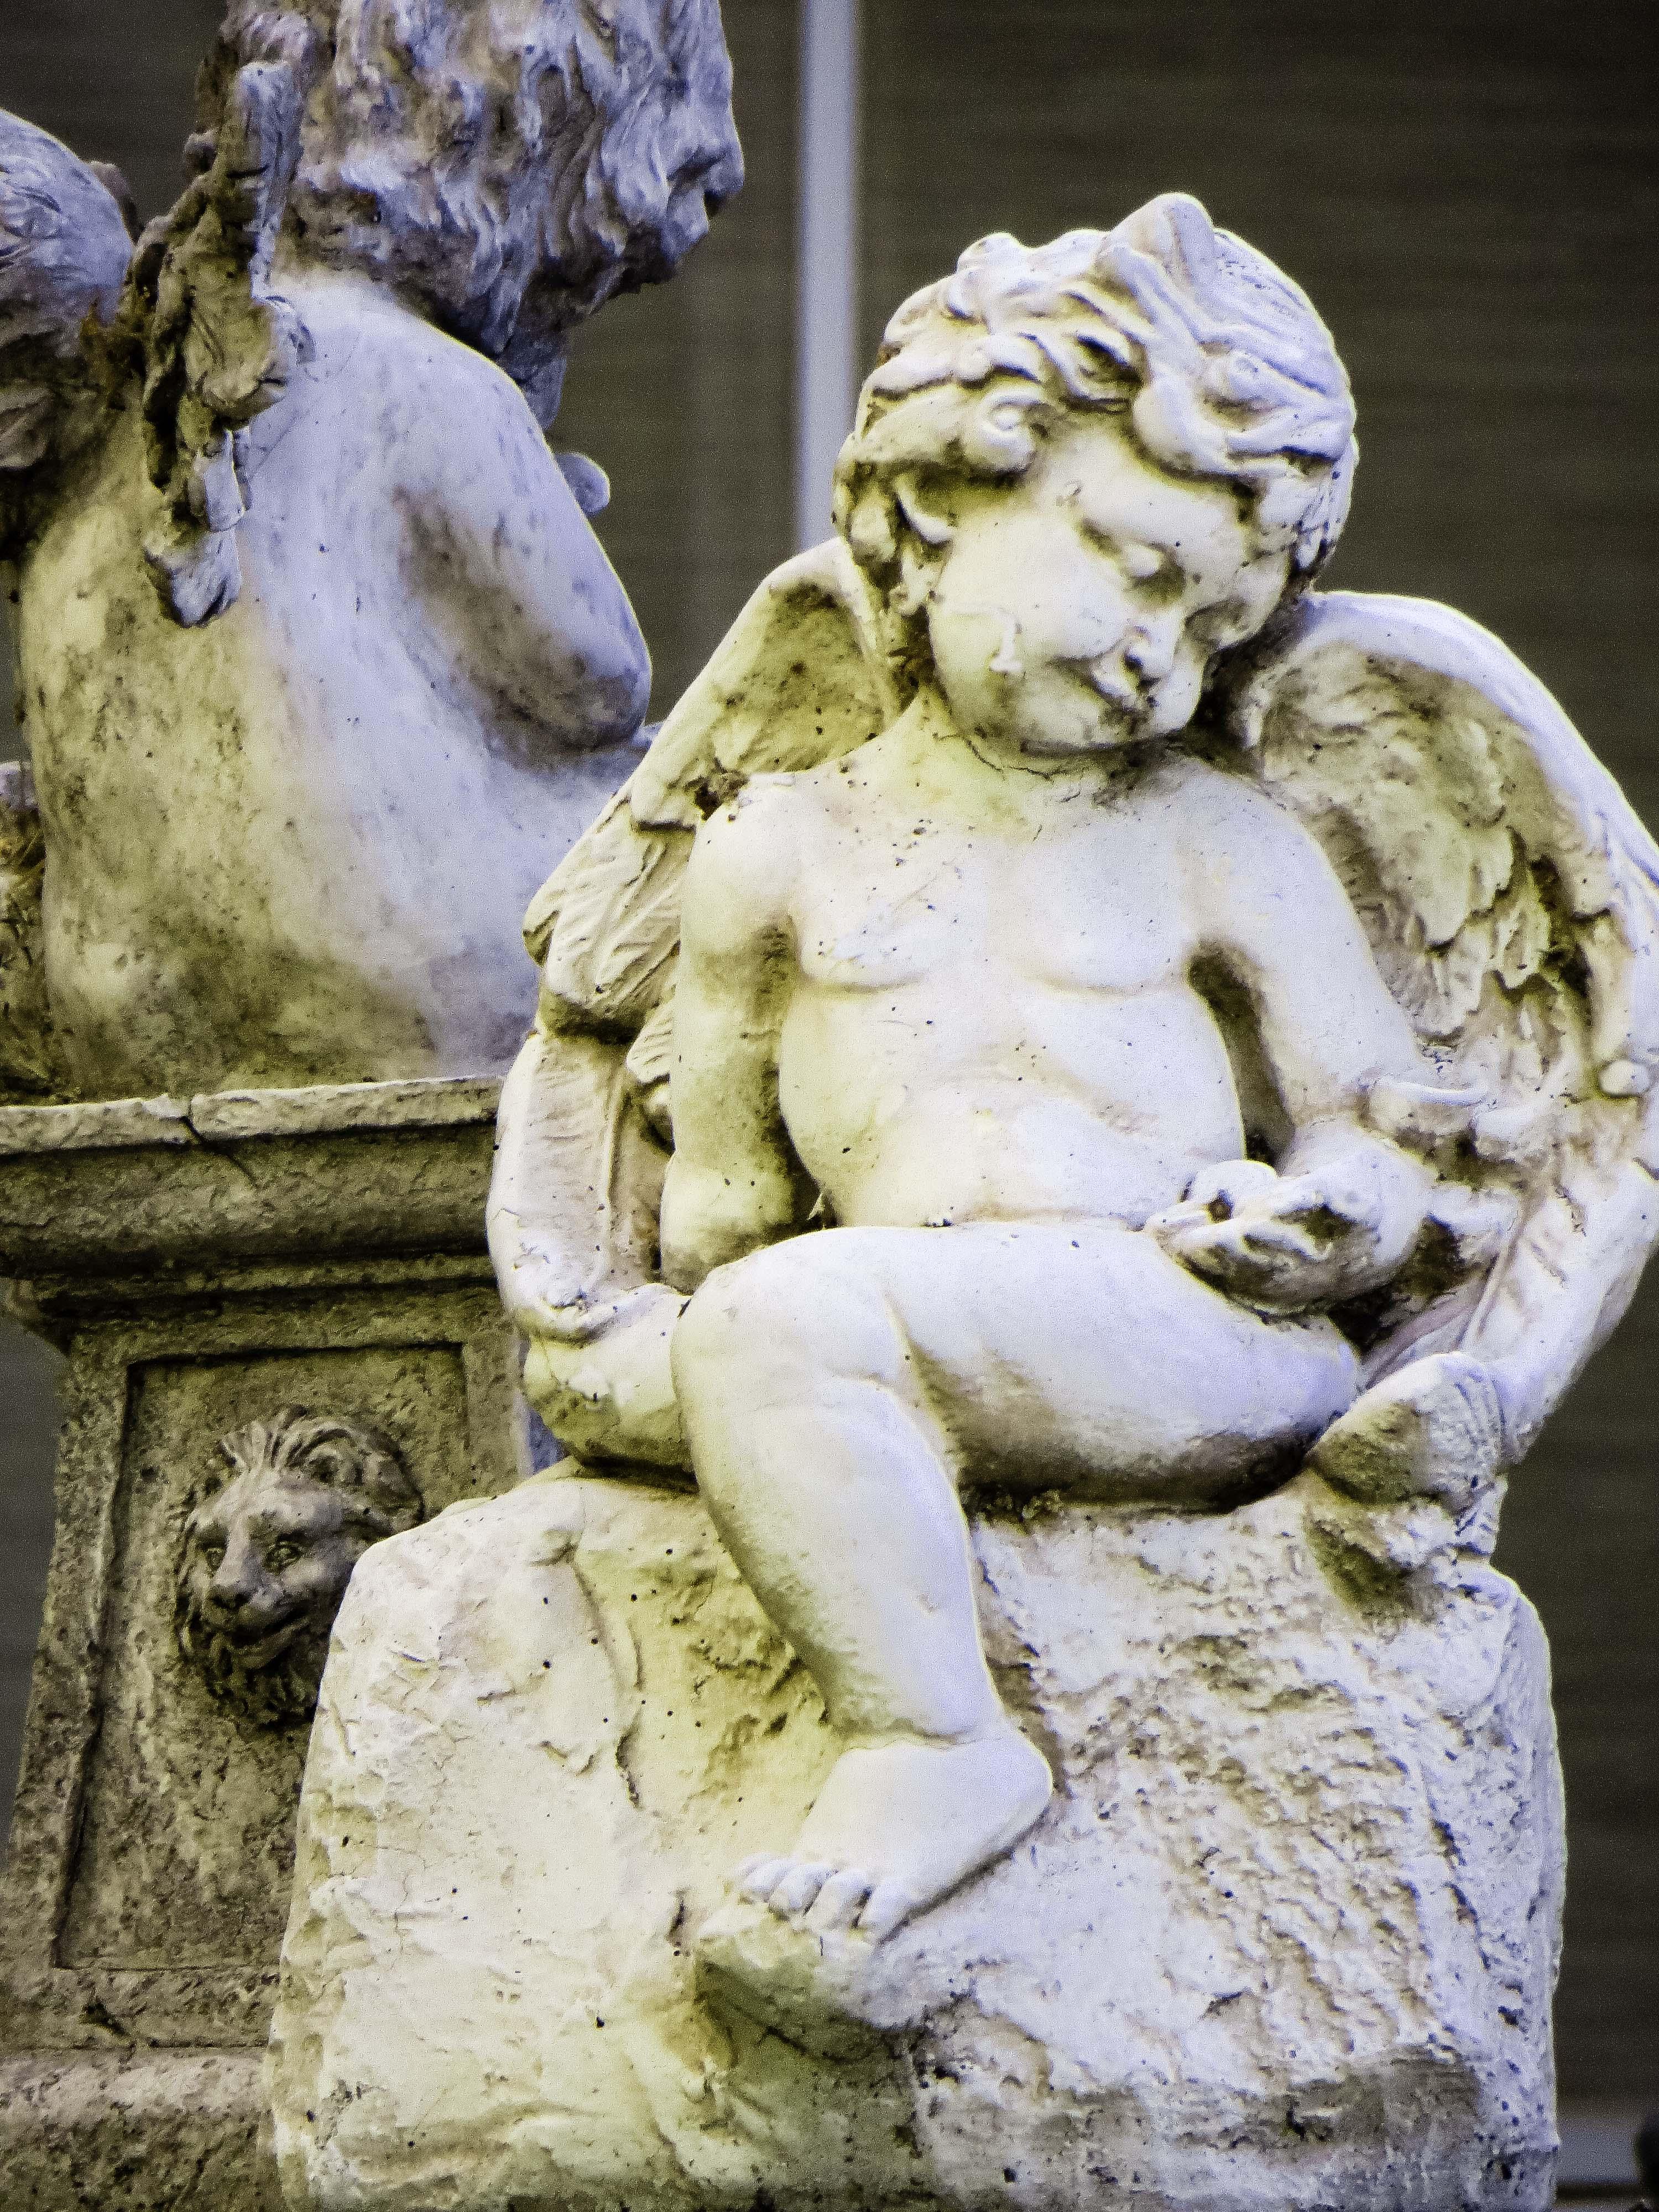 Sleeping Angel FLW 48804 kloytttyi.jpg